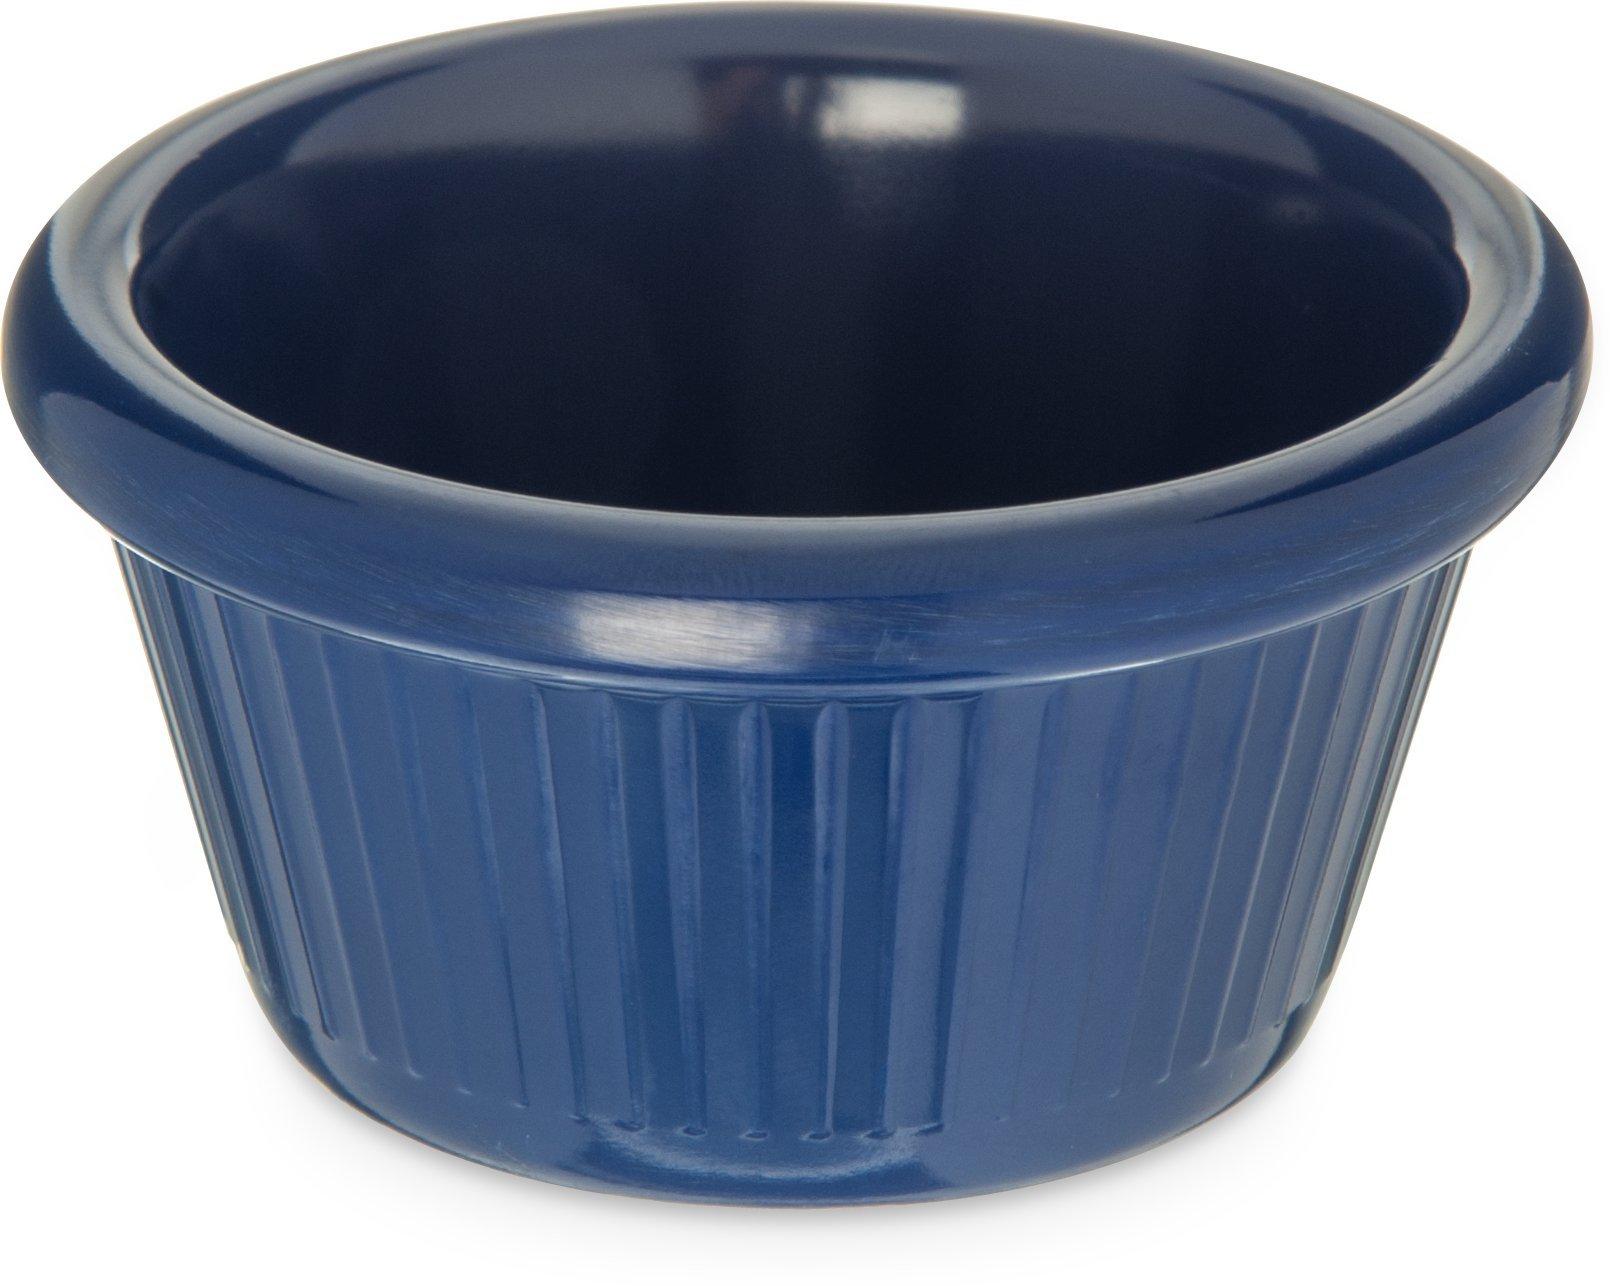 Carlisle S27960 Melamine Fluted Ramekin, 2 oz. Capacity, Cobalt Blue (Case of 48)